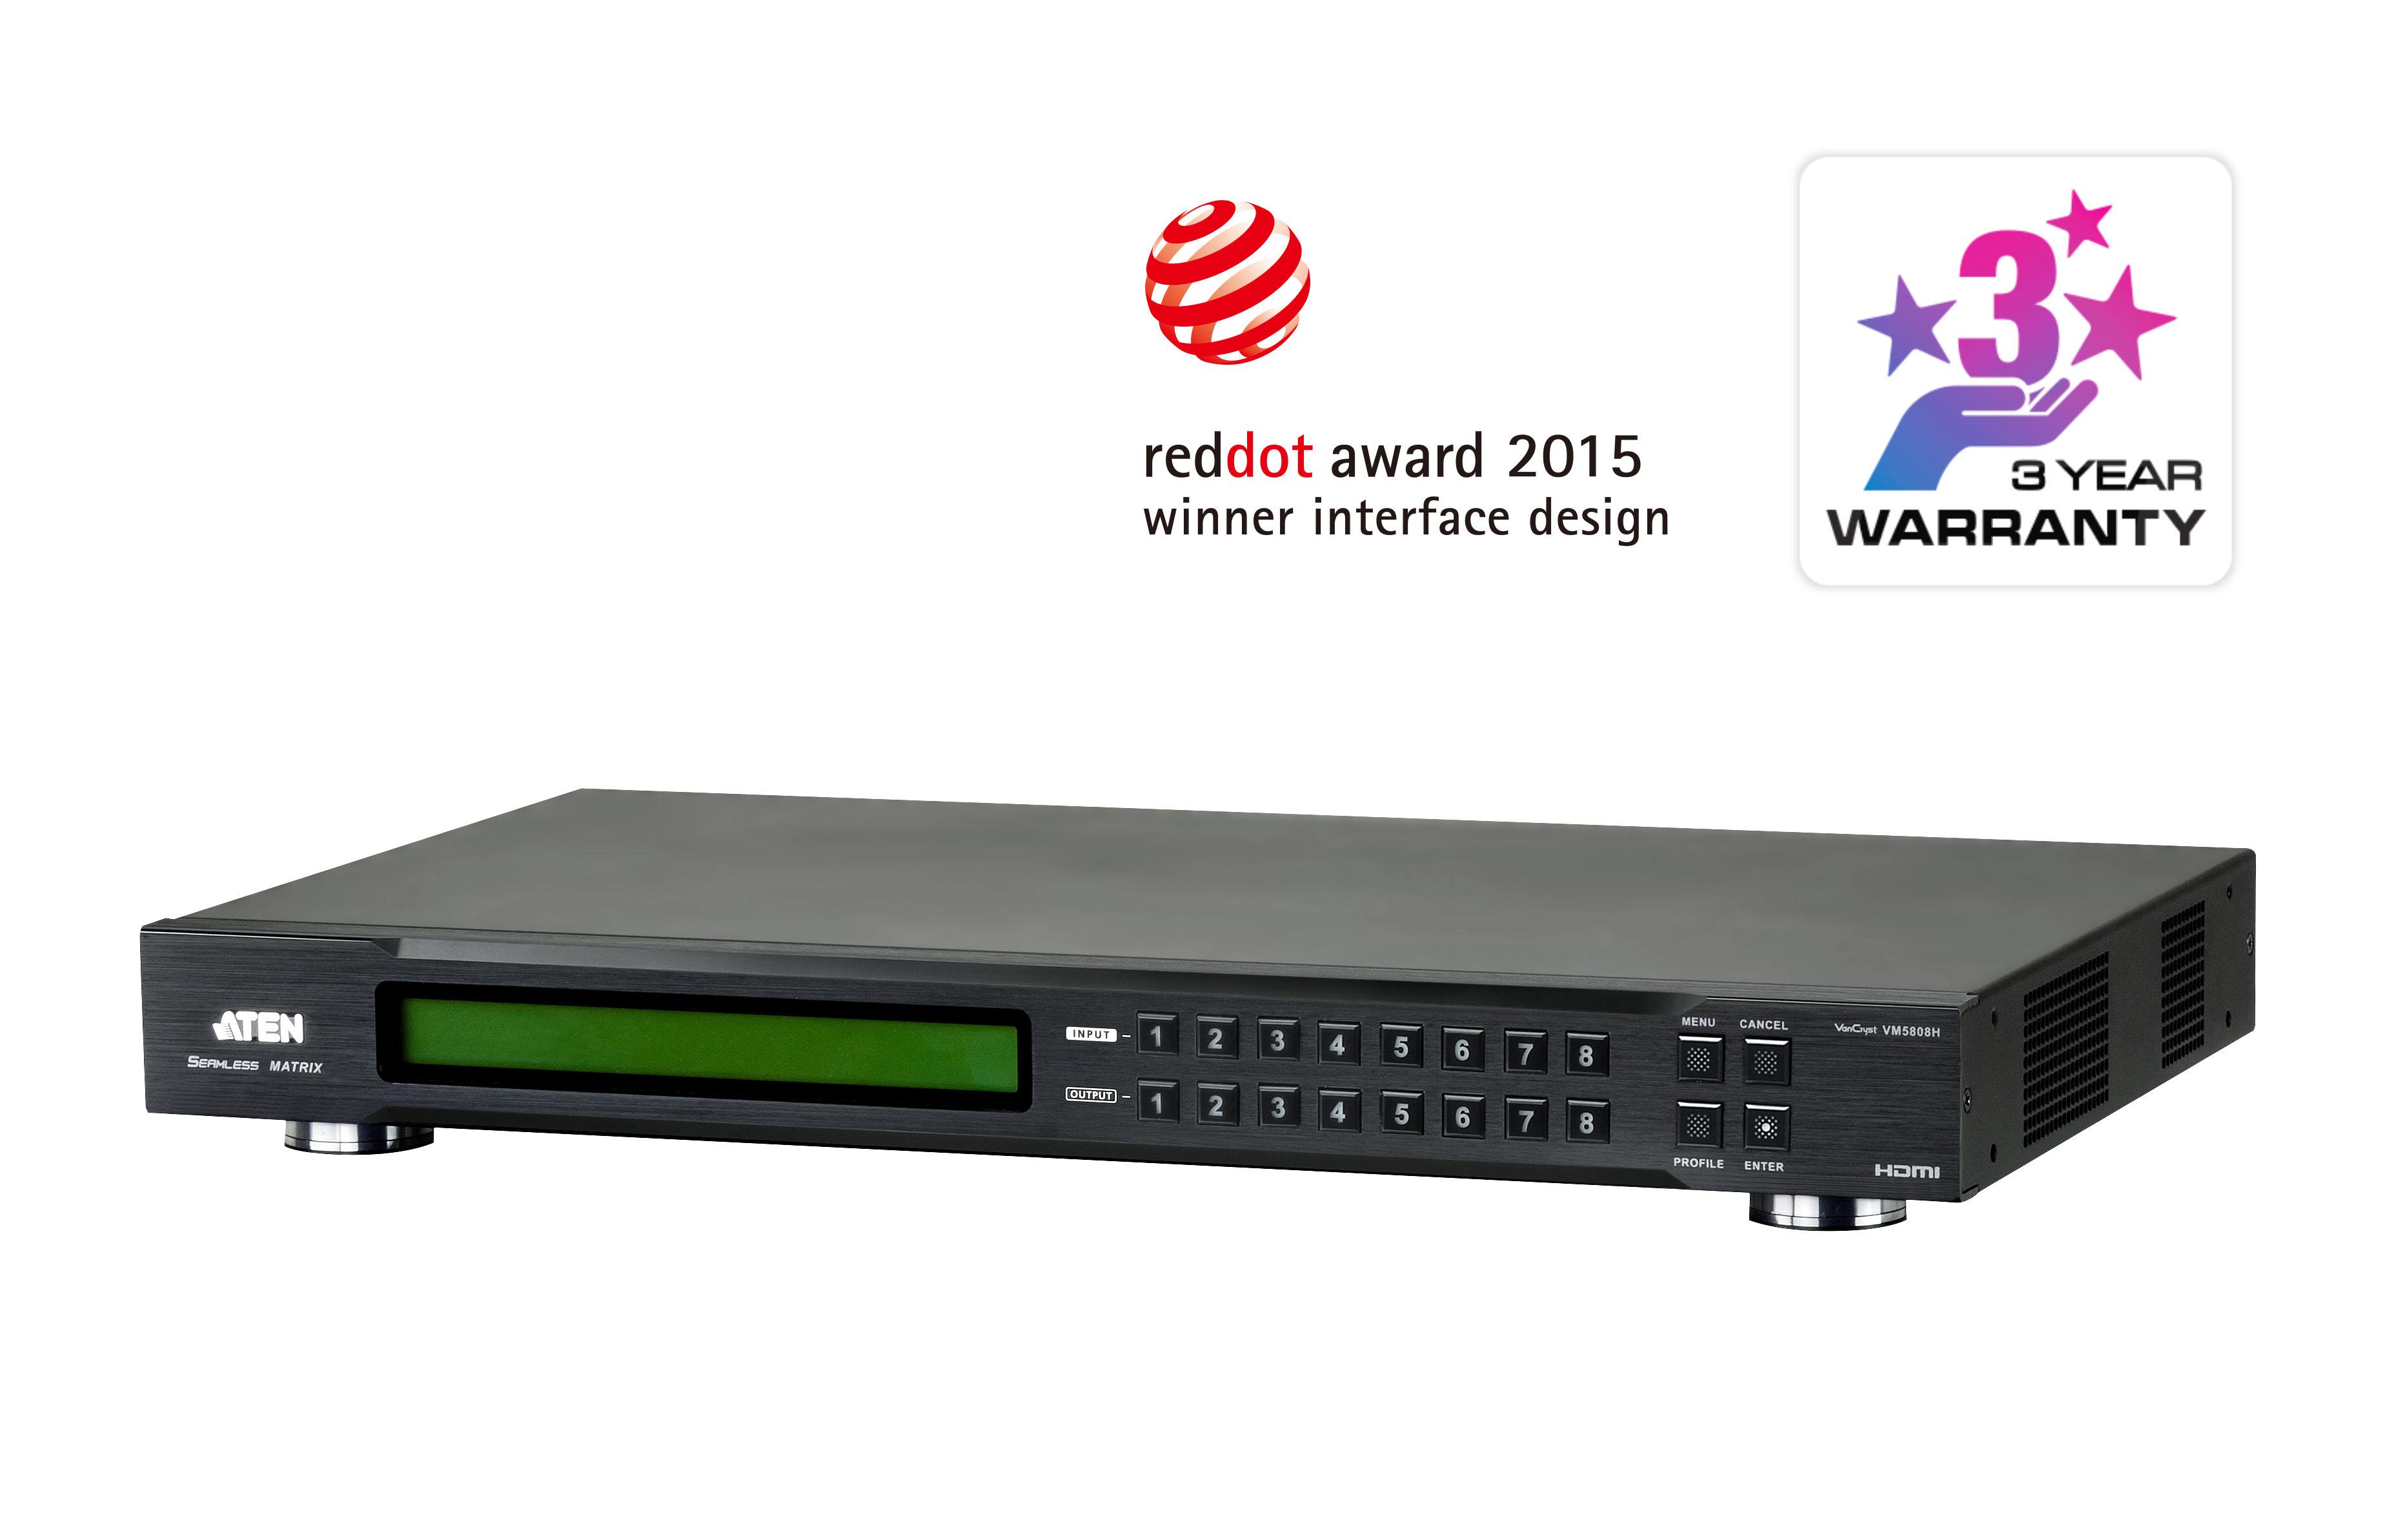 8 x 8 HDMI Matrix Switch with Videowall  Scaler - VM5808H, ATEN